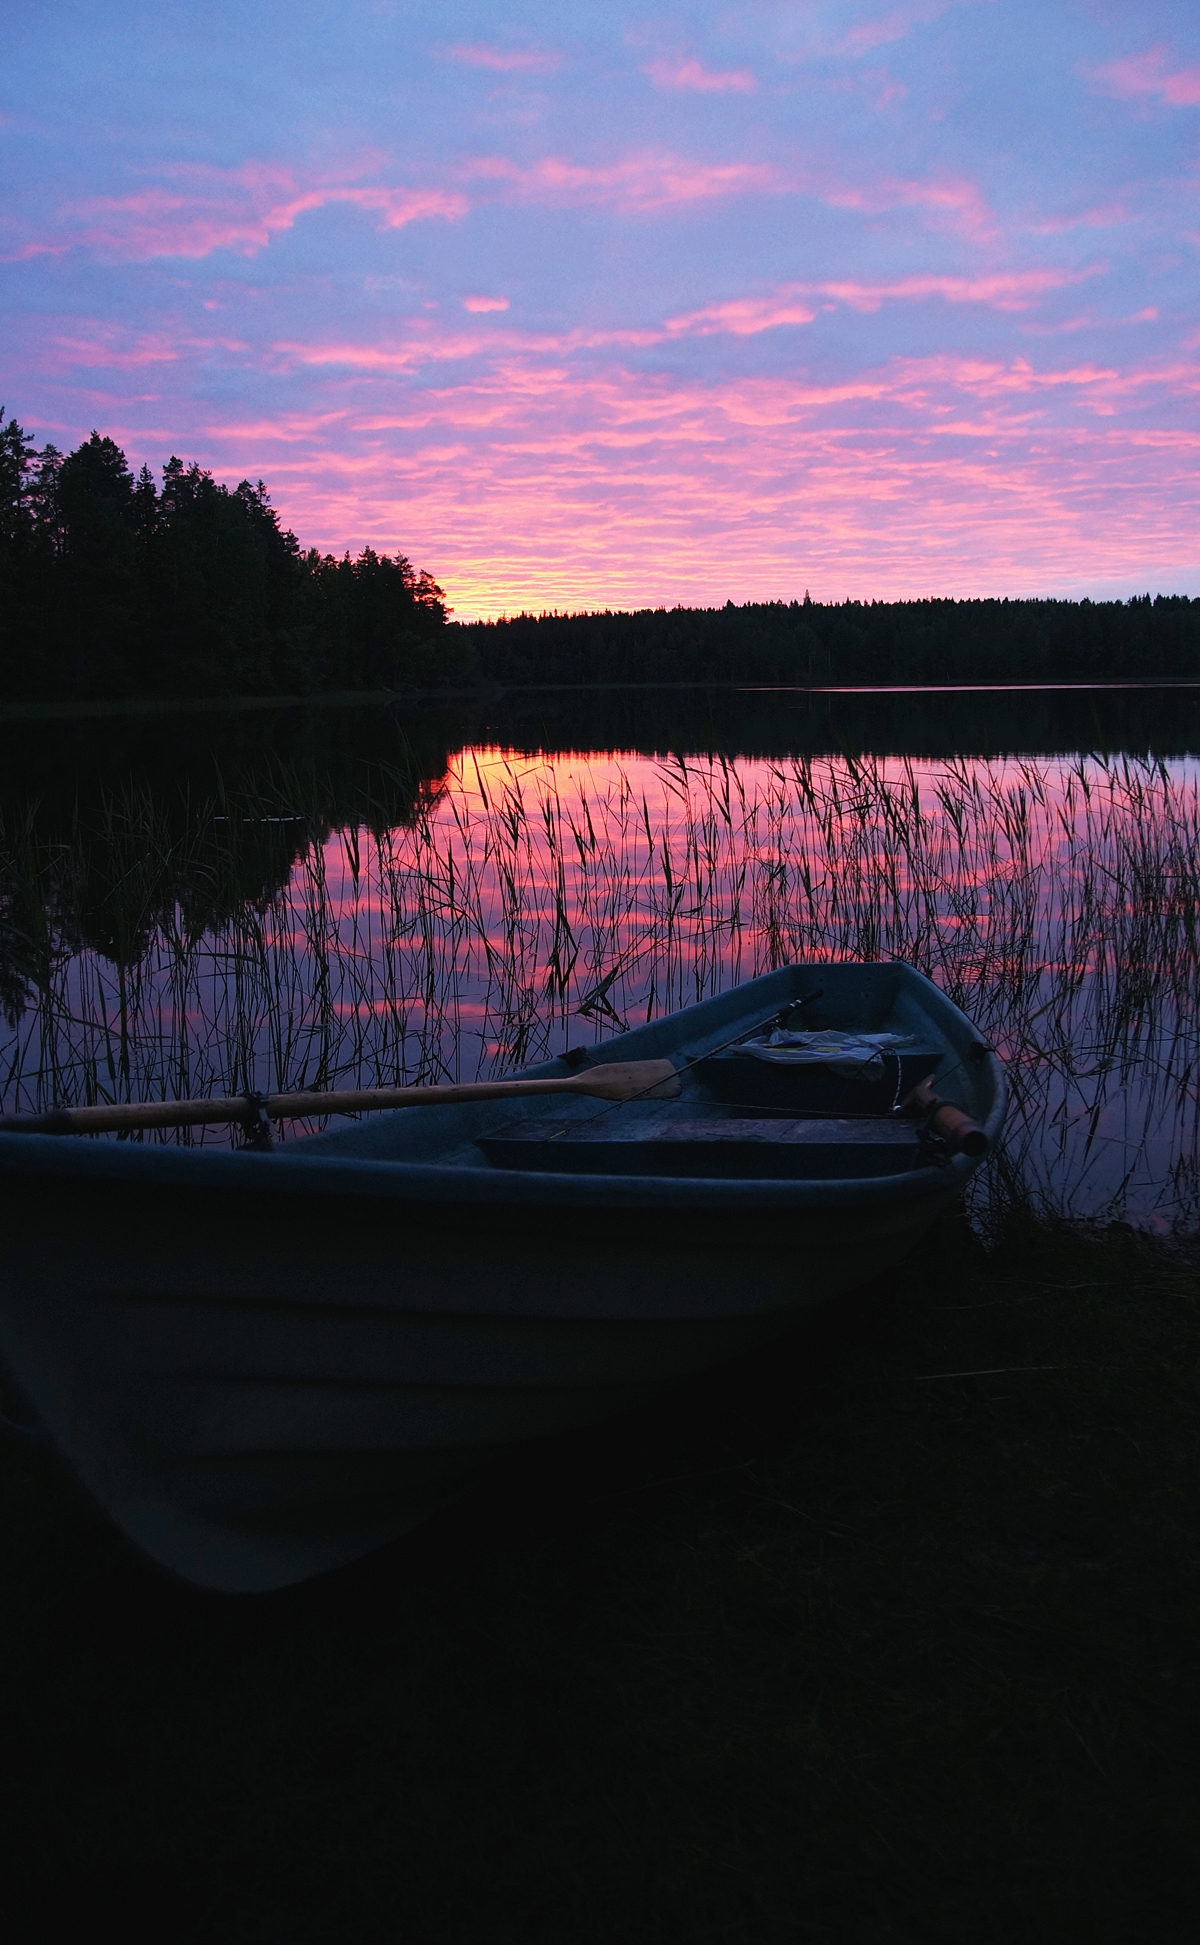 juhannus_auringonlasku2